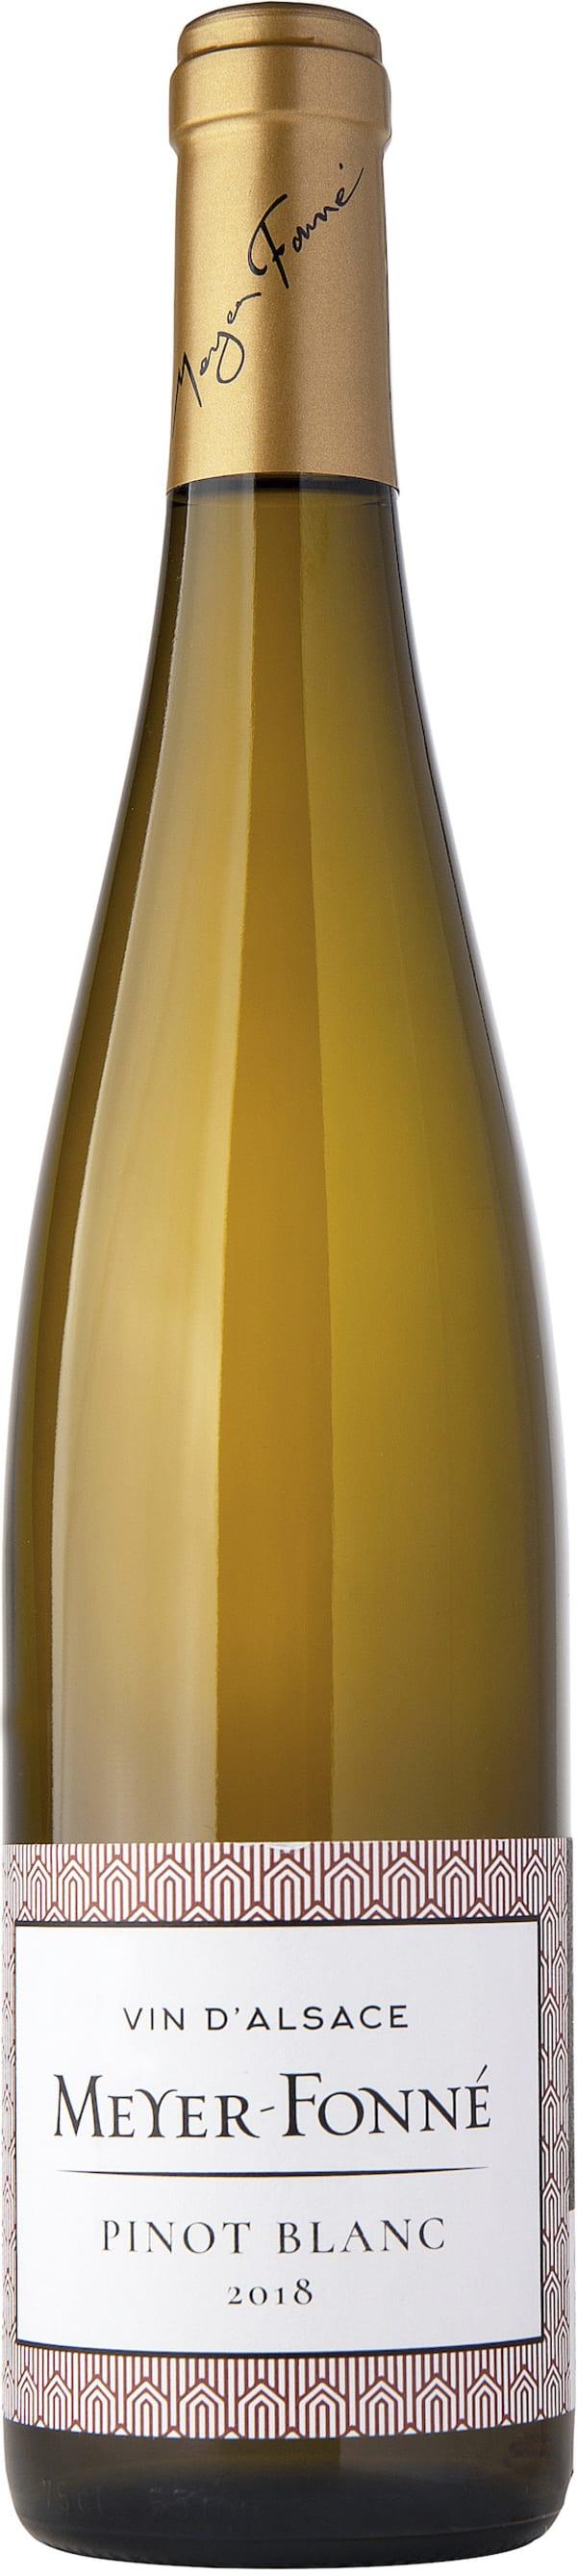 Meyer-Fonne Pinot Blanc 2018